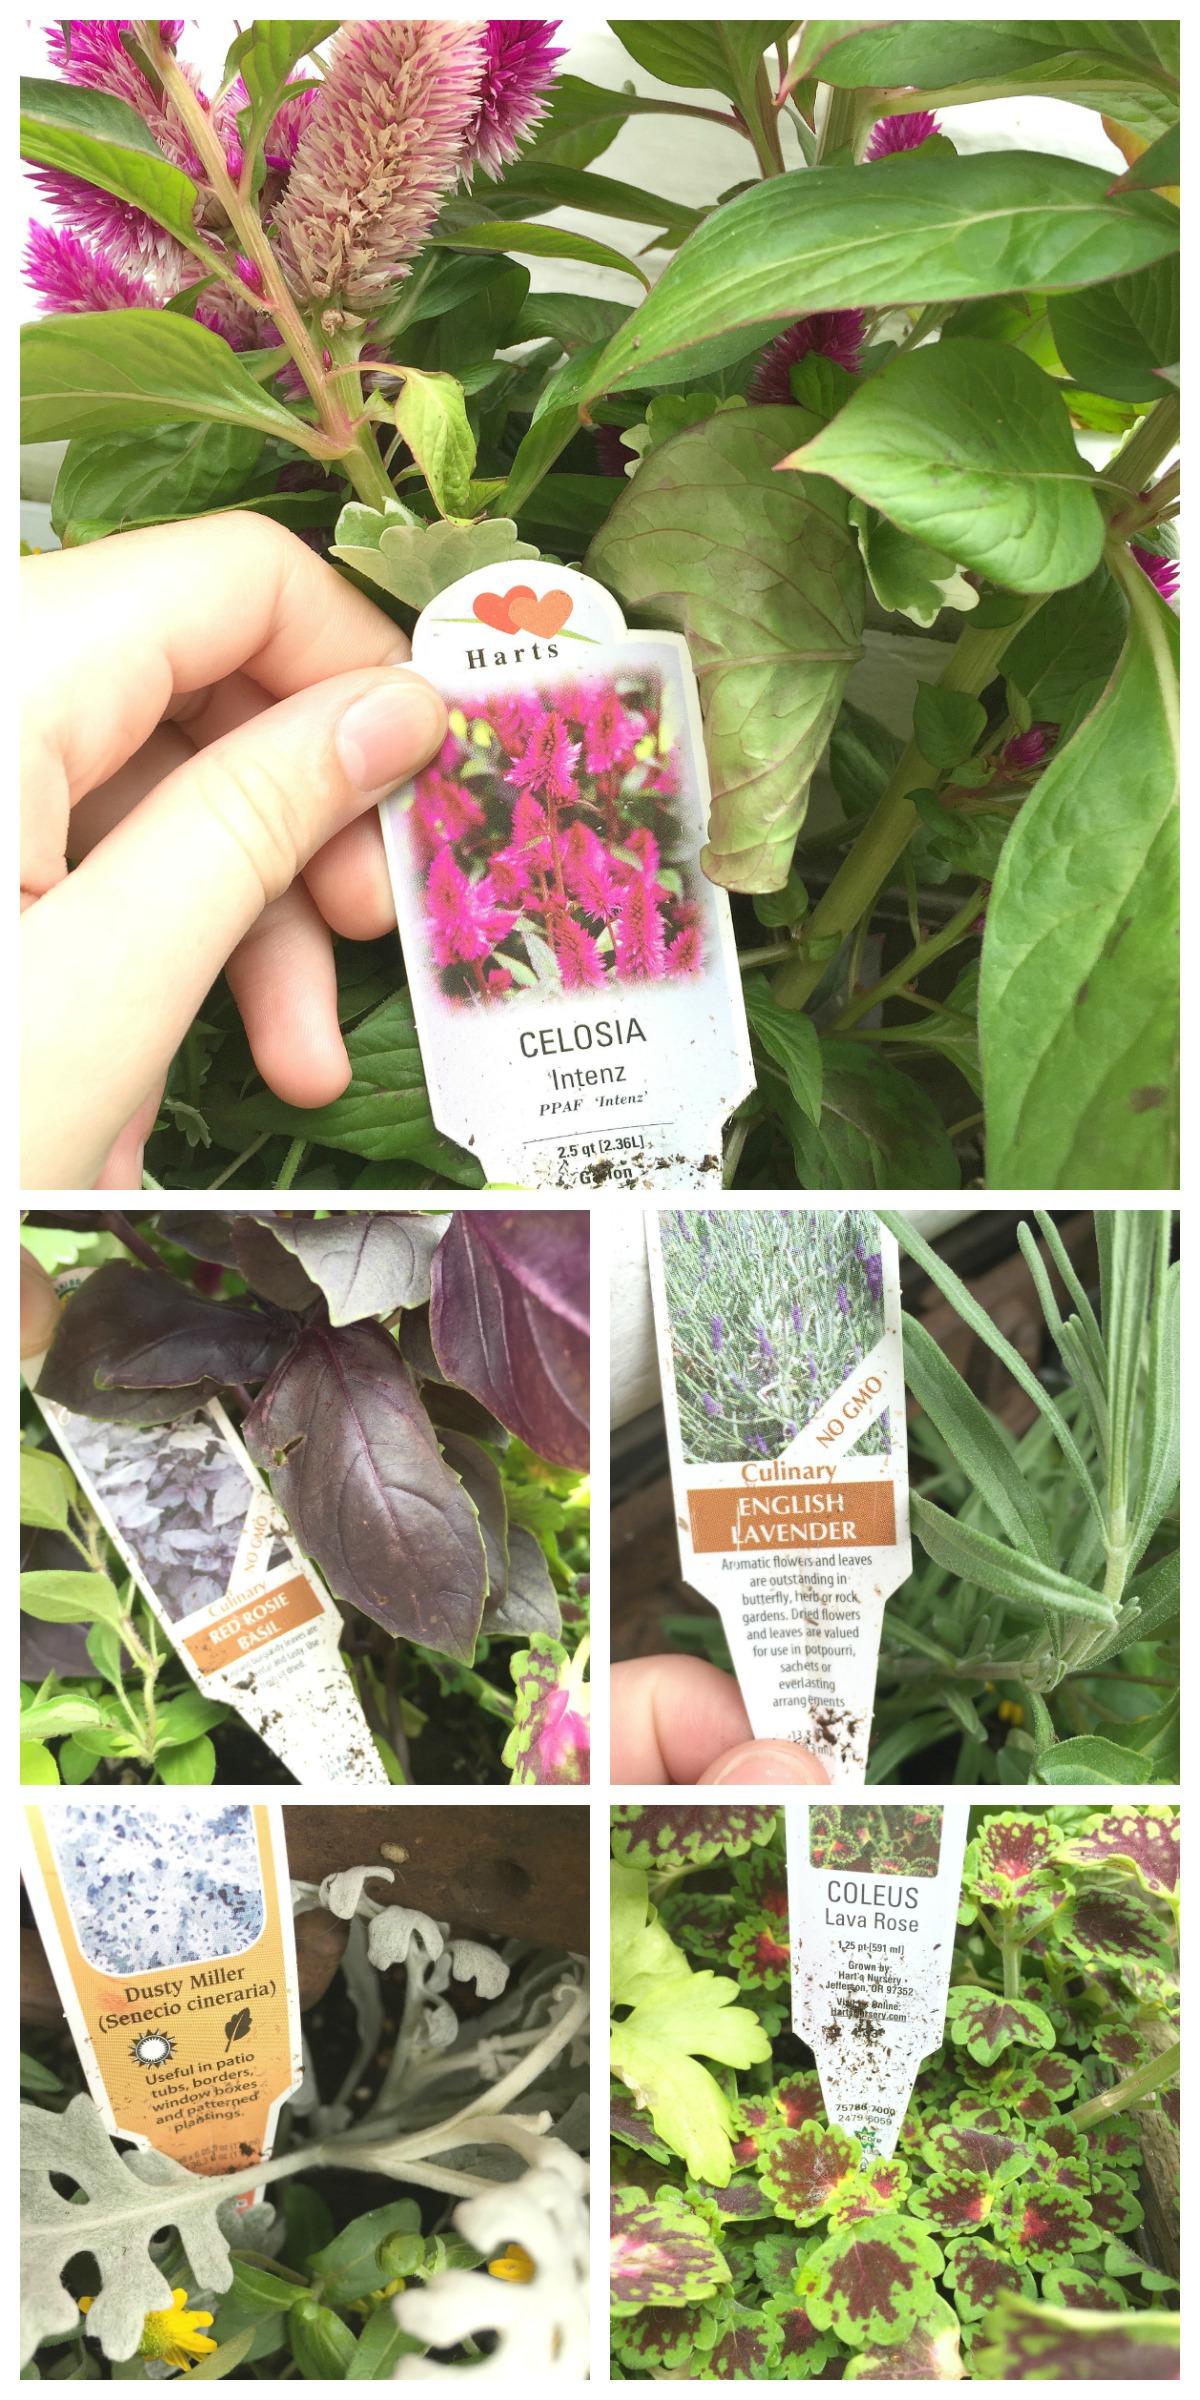 Farmhouse Planter Box for Herbs - Hallstrom Home